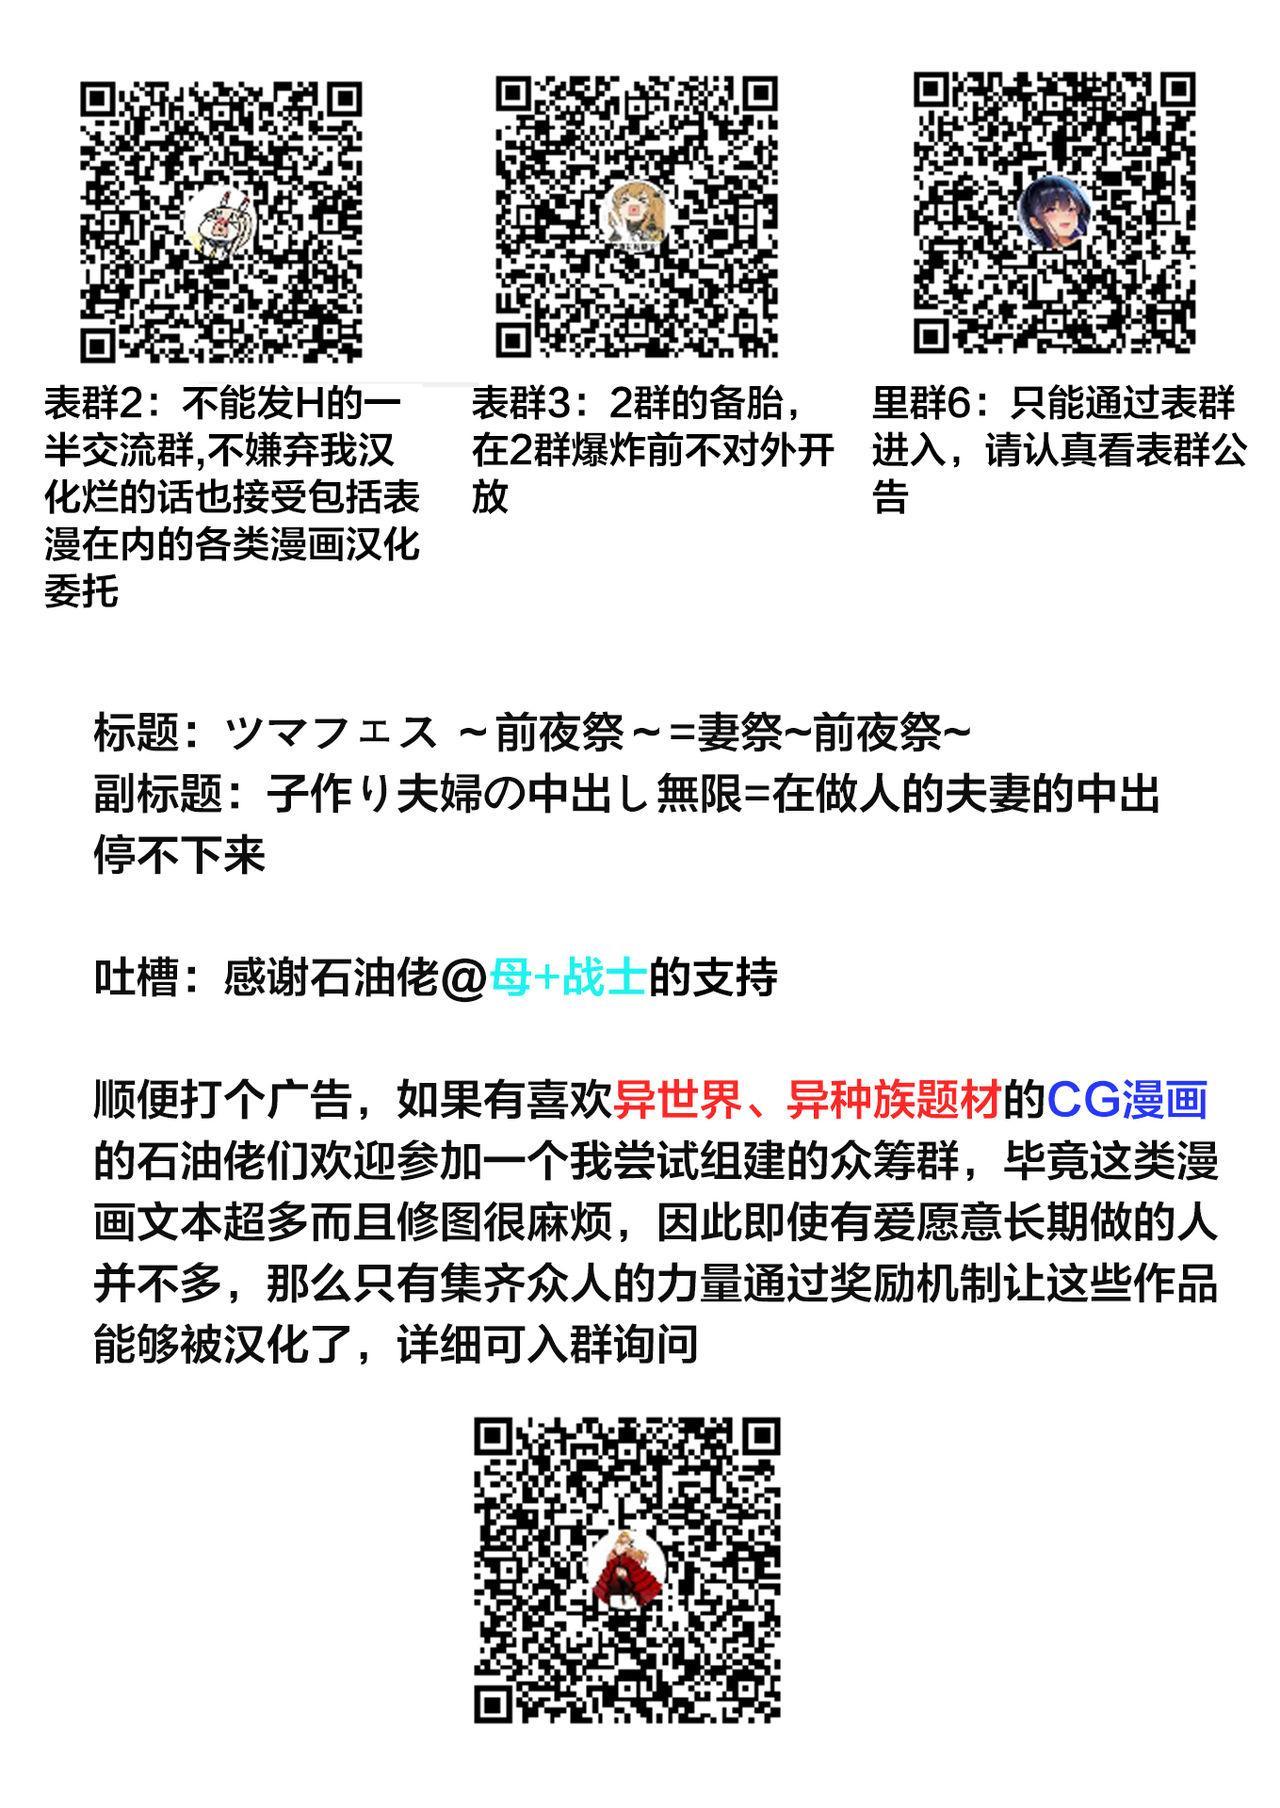 [Satsuki Imonet] Tsuma Fes ~Zenyasai~ - Milf Creampie Festival!!! (COMIC Shitsurakuten 2021-01) [Chinese] [下北泽幕府] [Digital] 16